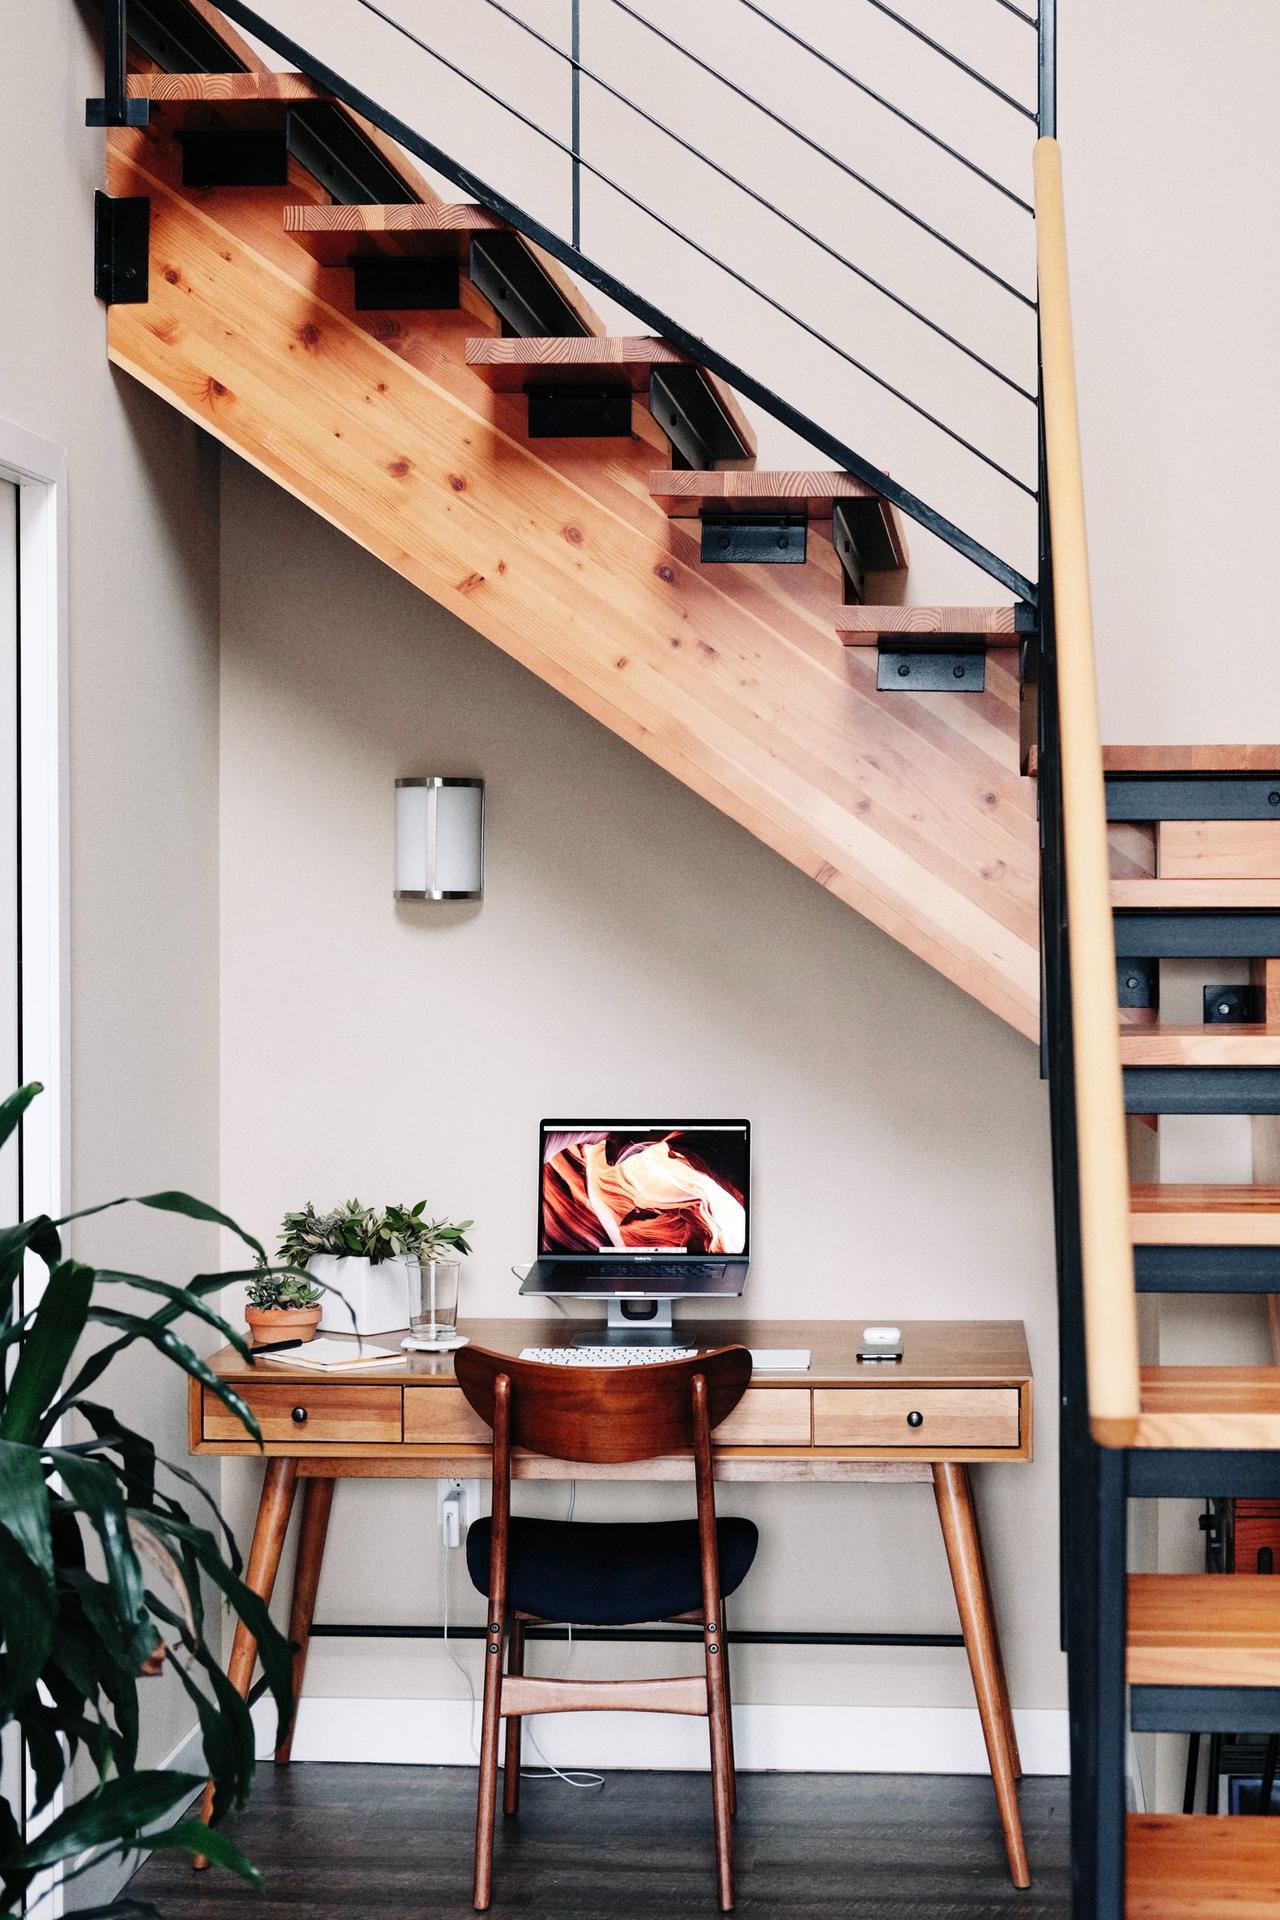 Interior design ideas for New York City apartments.